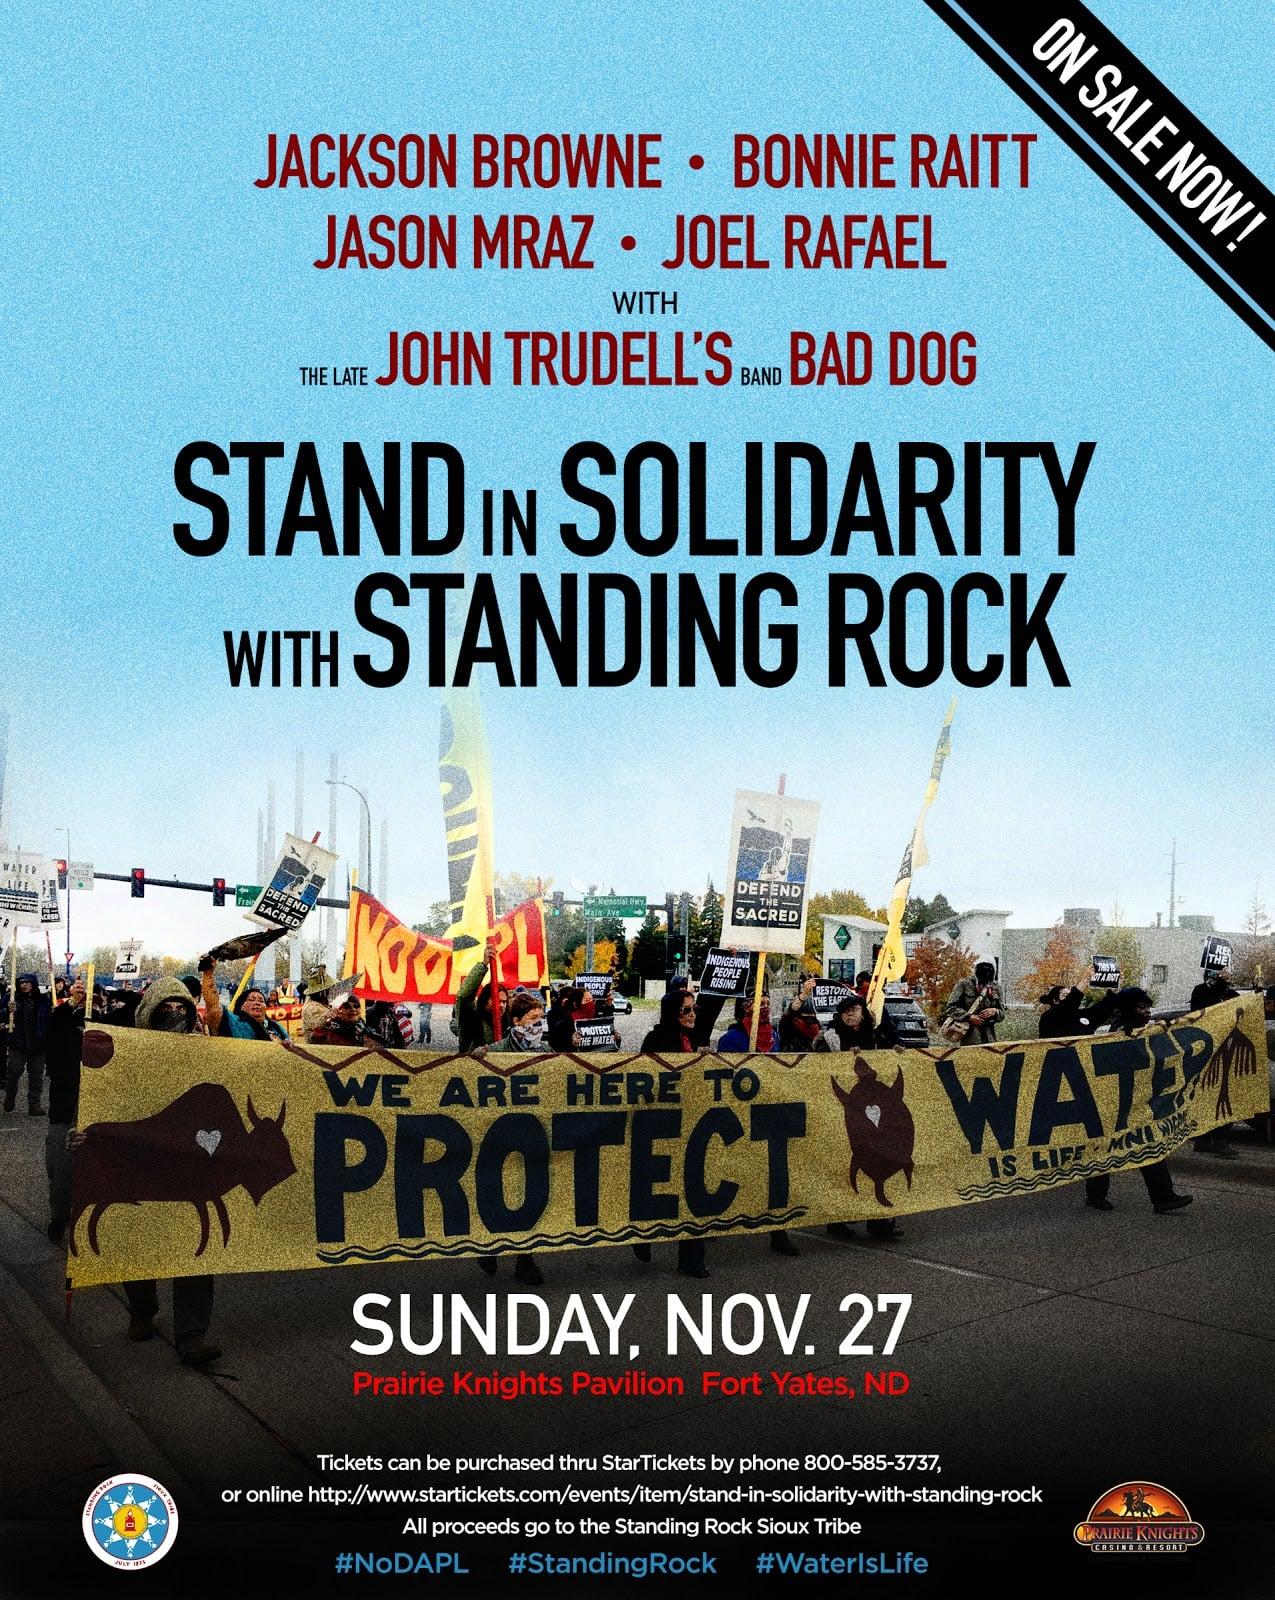 Jackson Browne - Bonnie Raitt Concert nodapl poster